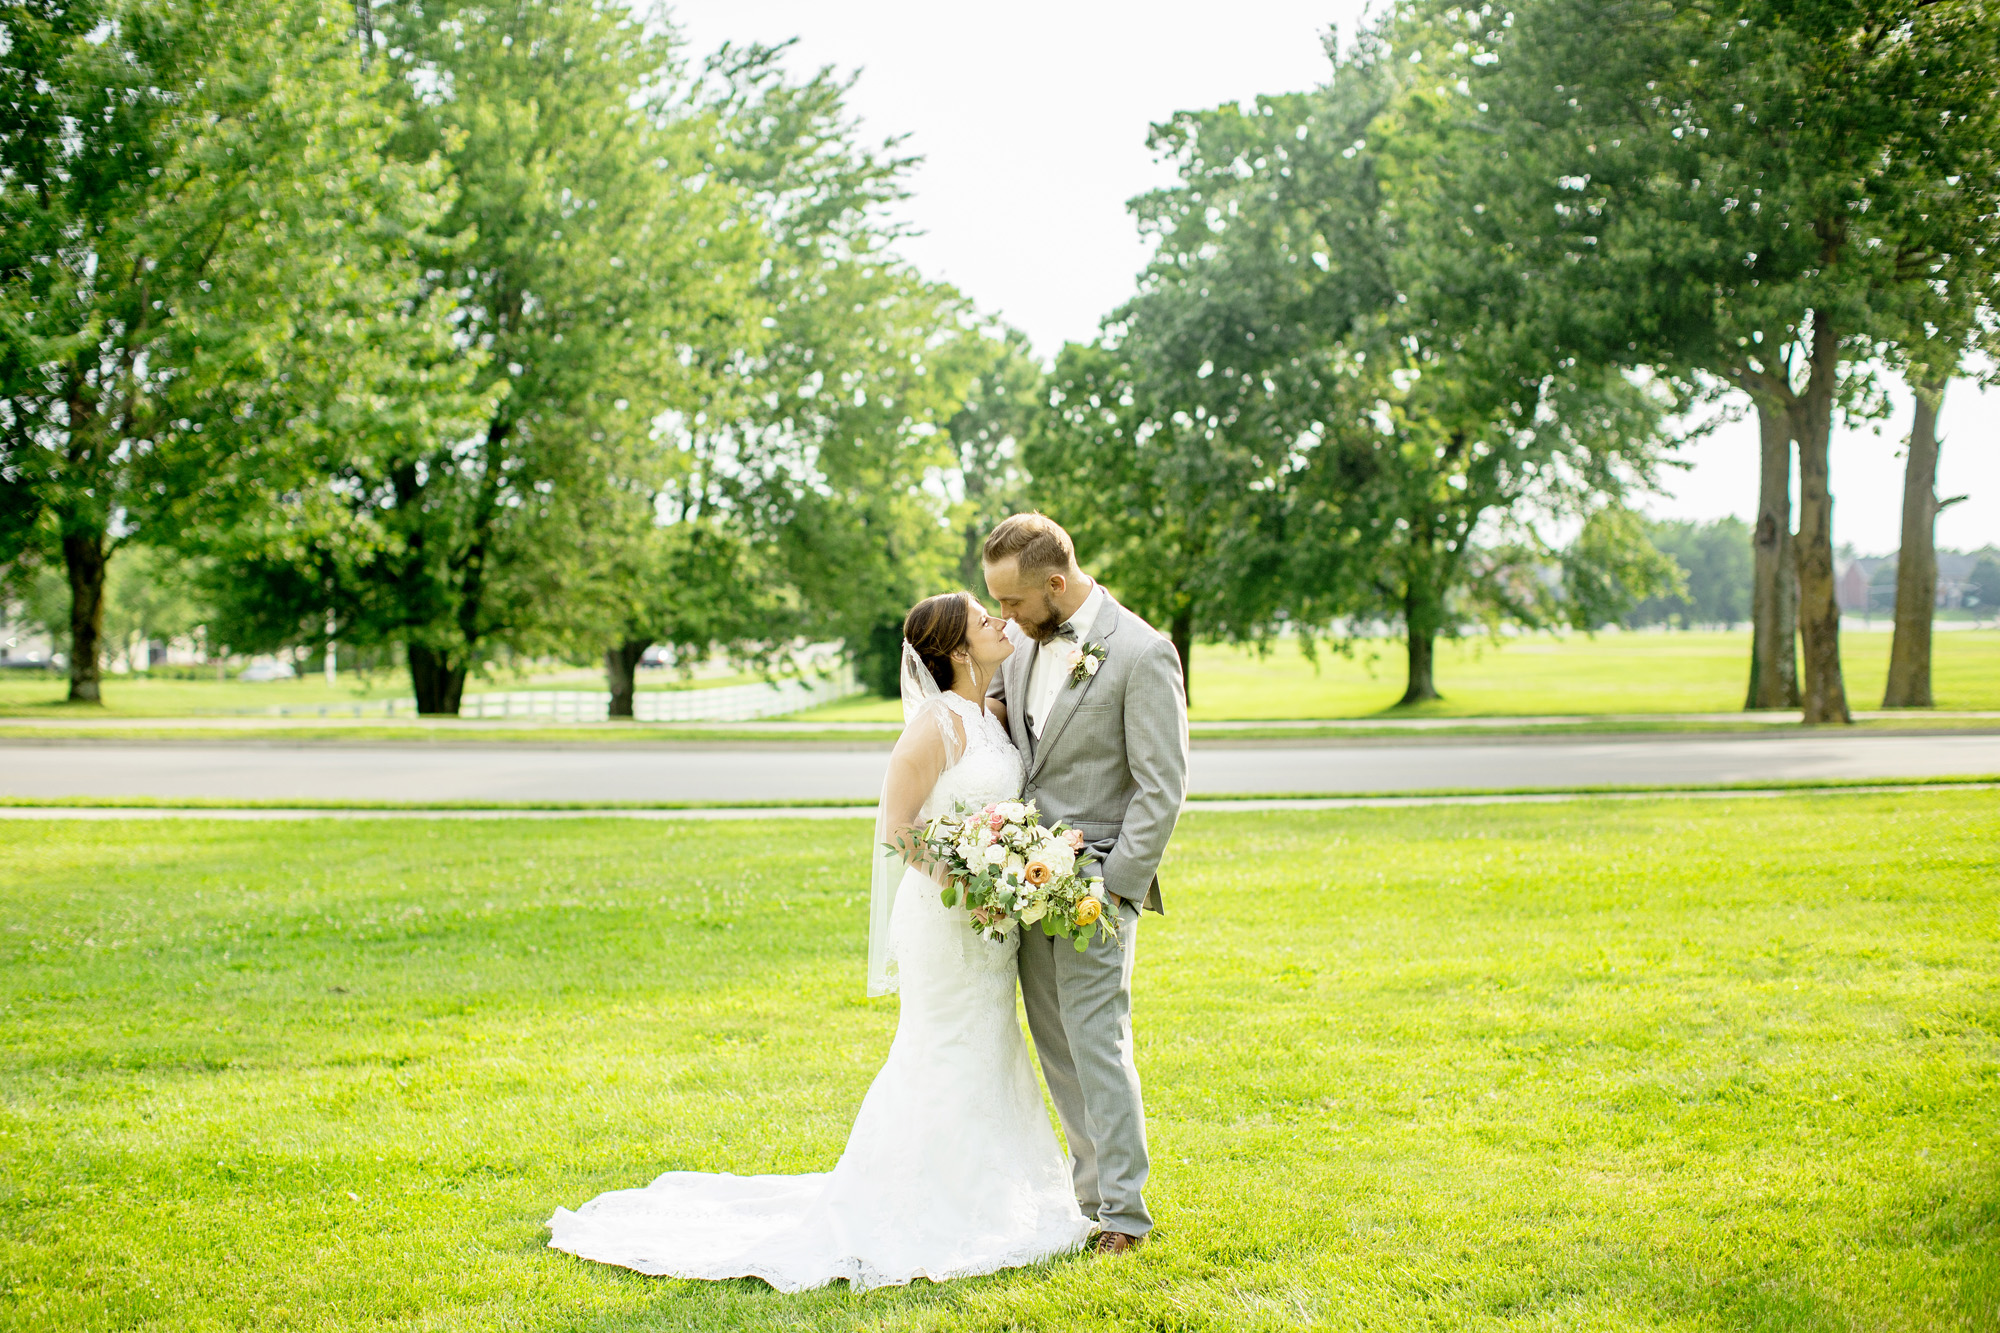 Seriously_Sabrina_Photography_Lexington_Kentucky_Round_Barn_Red_Mile_Stable_of_Memories_Wedding_Hart_83.jpg